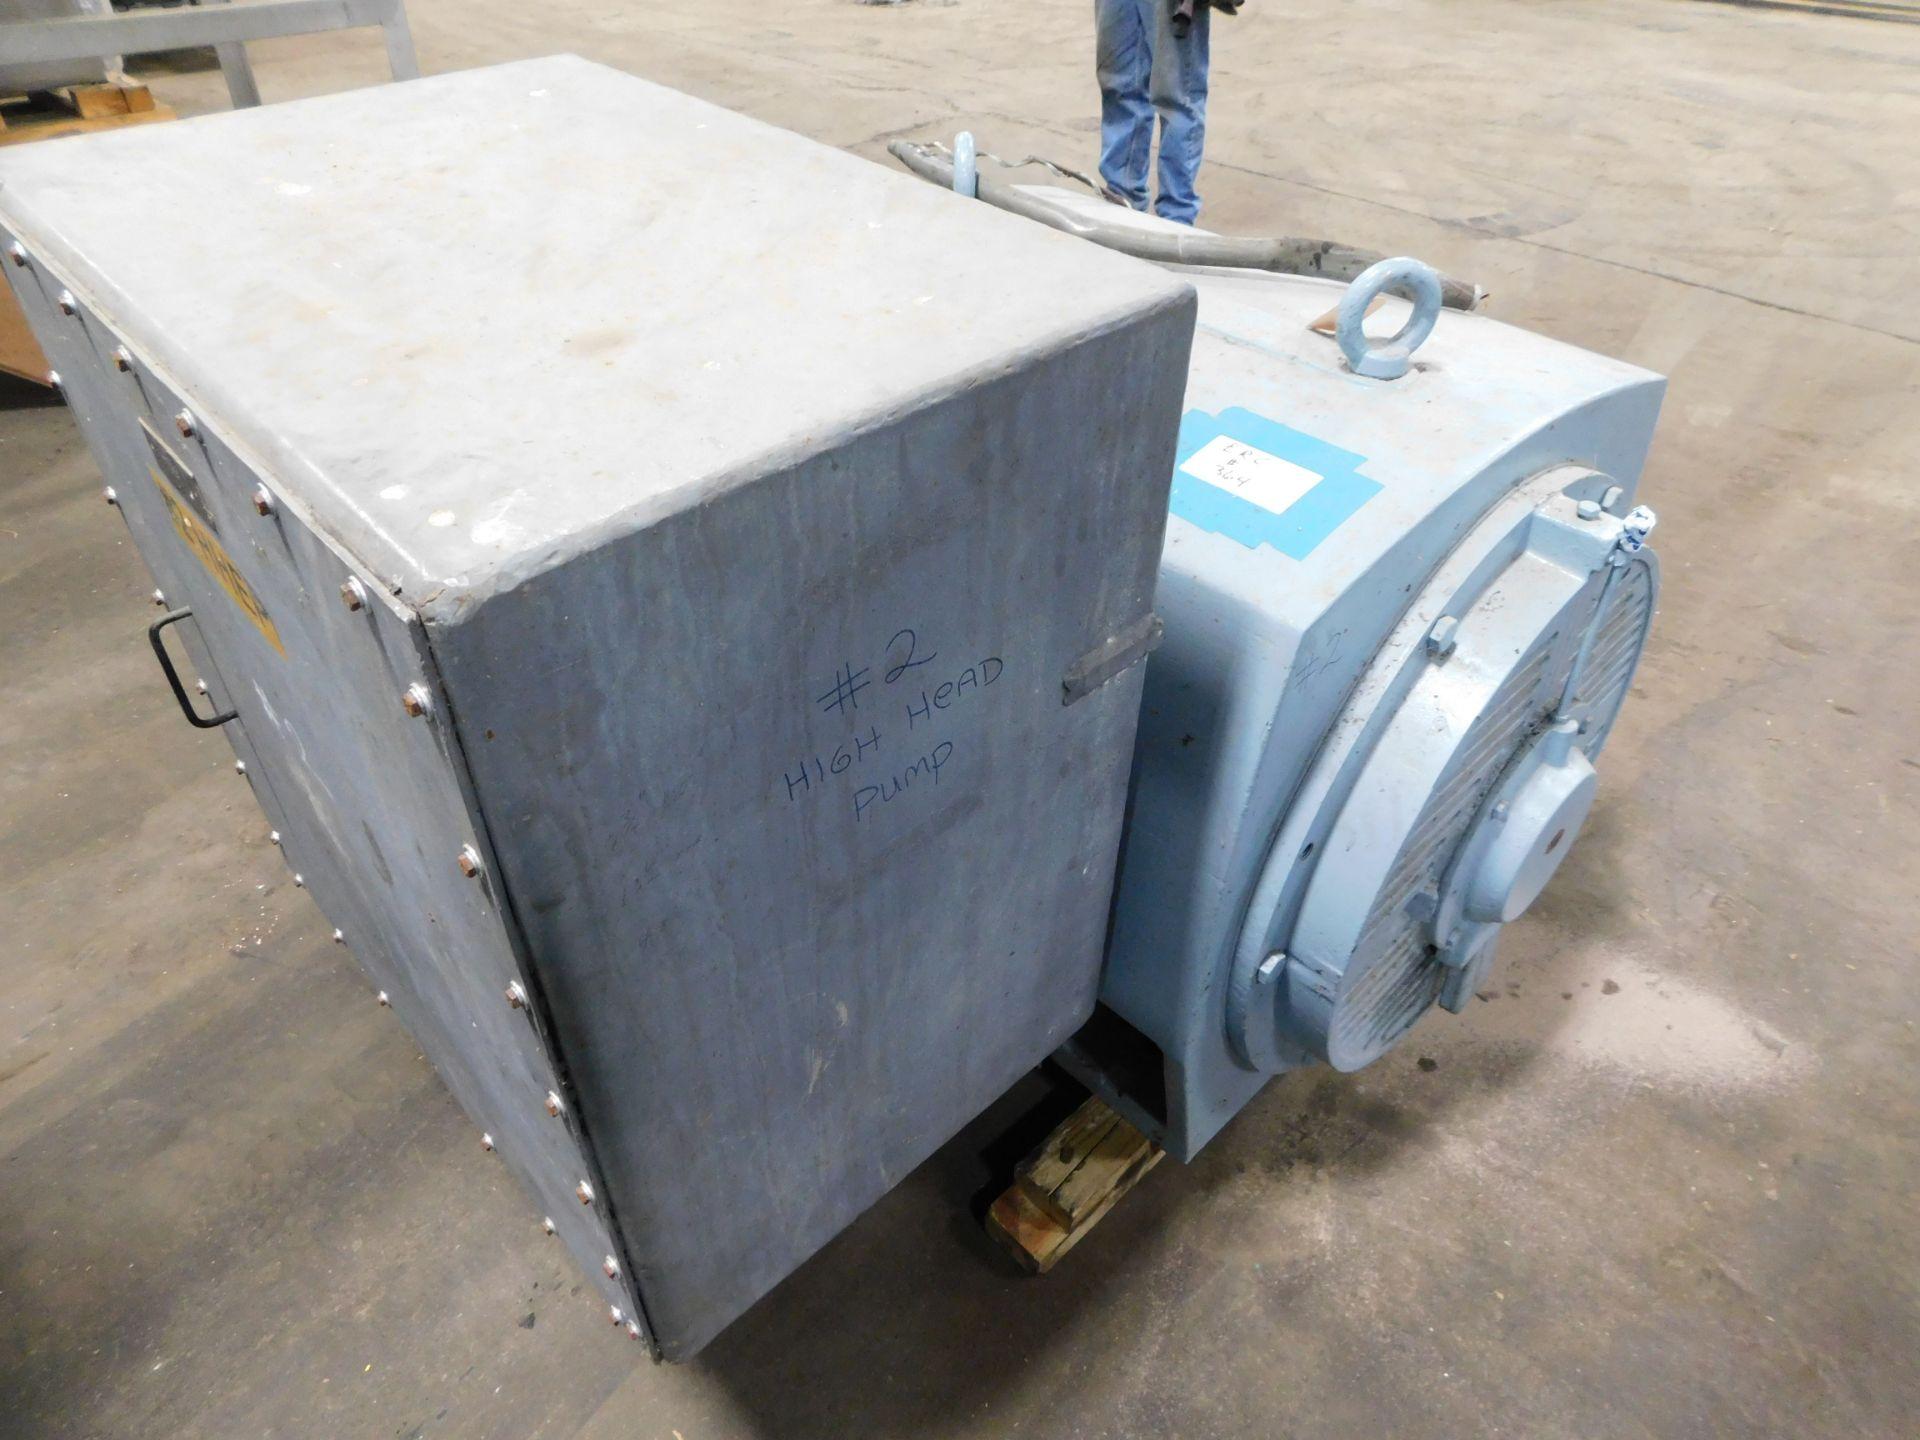 Teco Induction Motor. 600 HP. 3 Ph. 2300/4160 V. 60 Hz. 1780 RPM. 5808B. ASHA-PA001. - Image 4 of 6